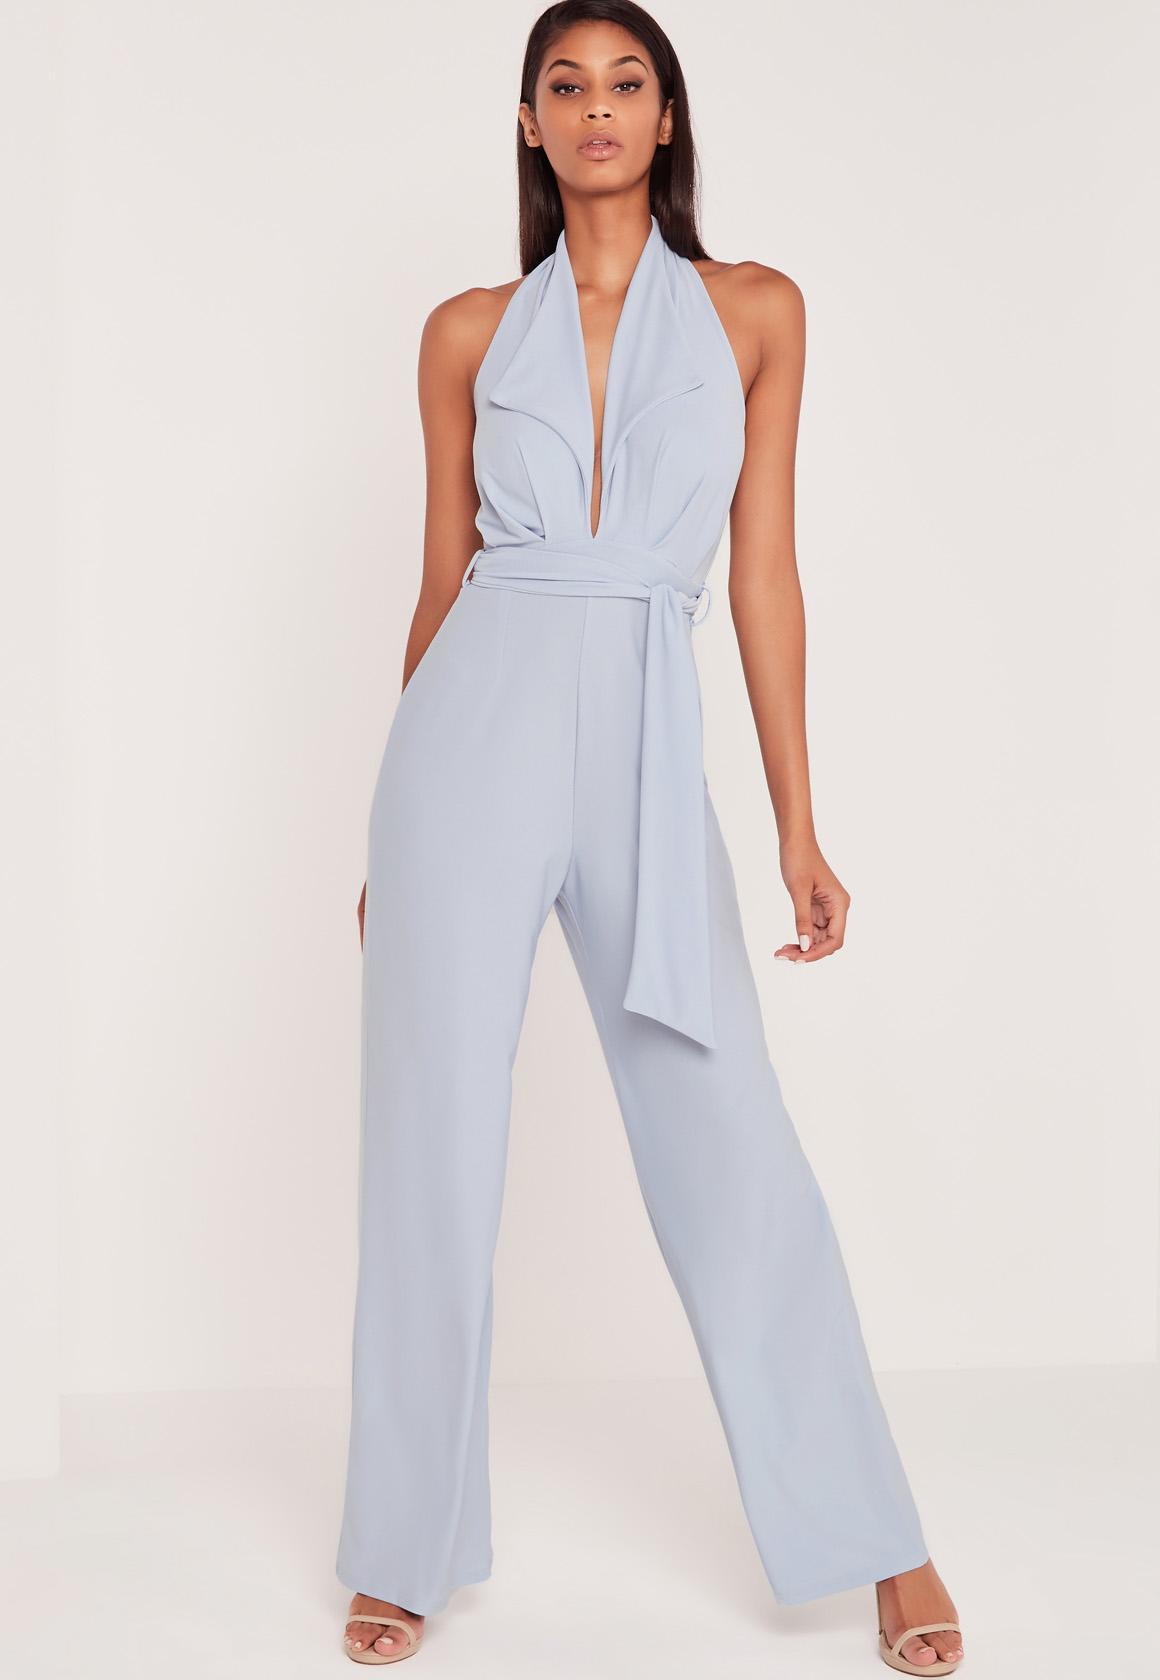 carli bybel blazer style wide leg jumpsuit blue - Combinaison: история одной униформы